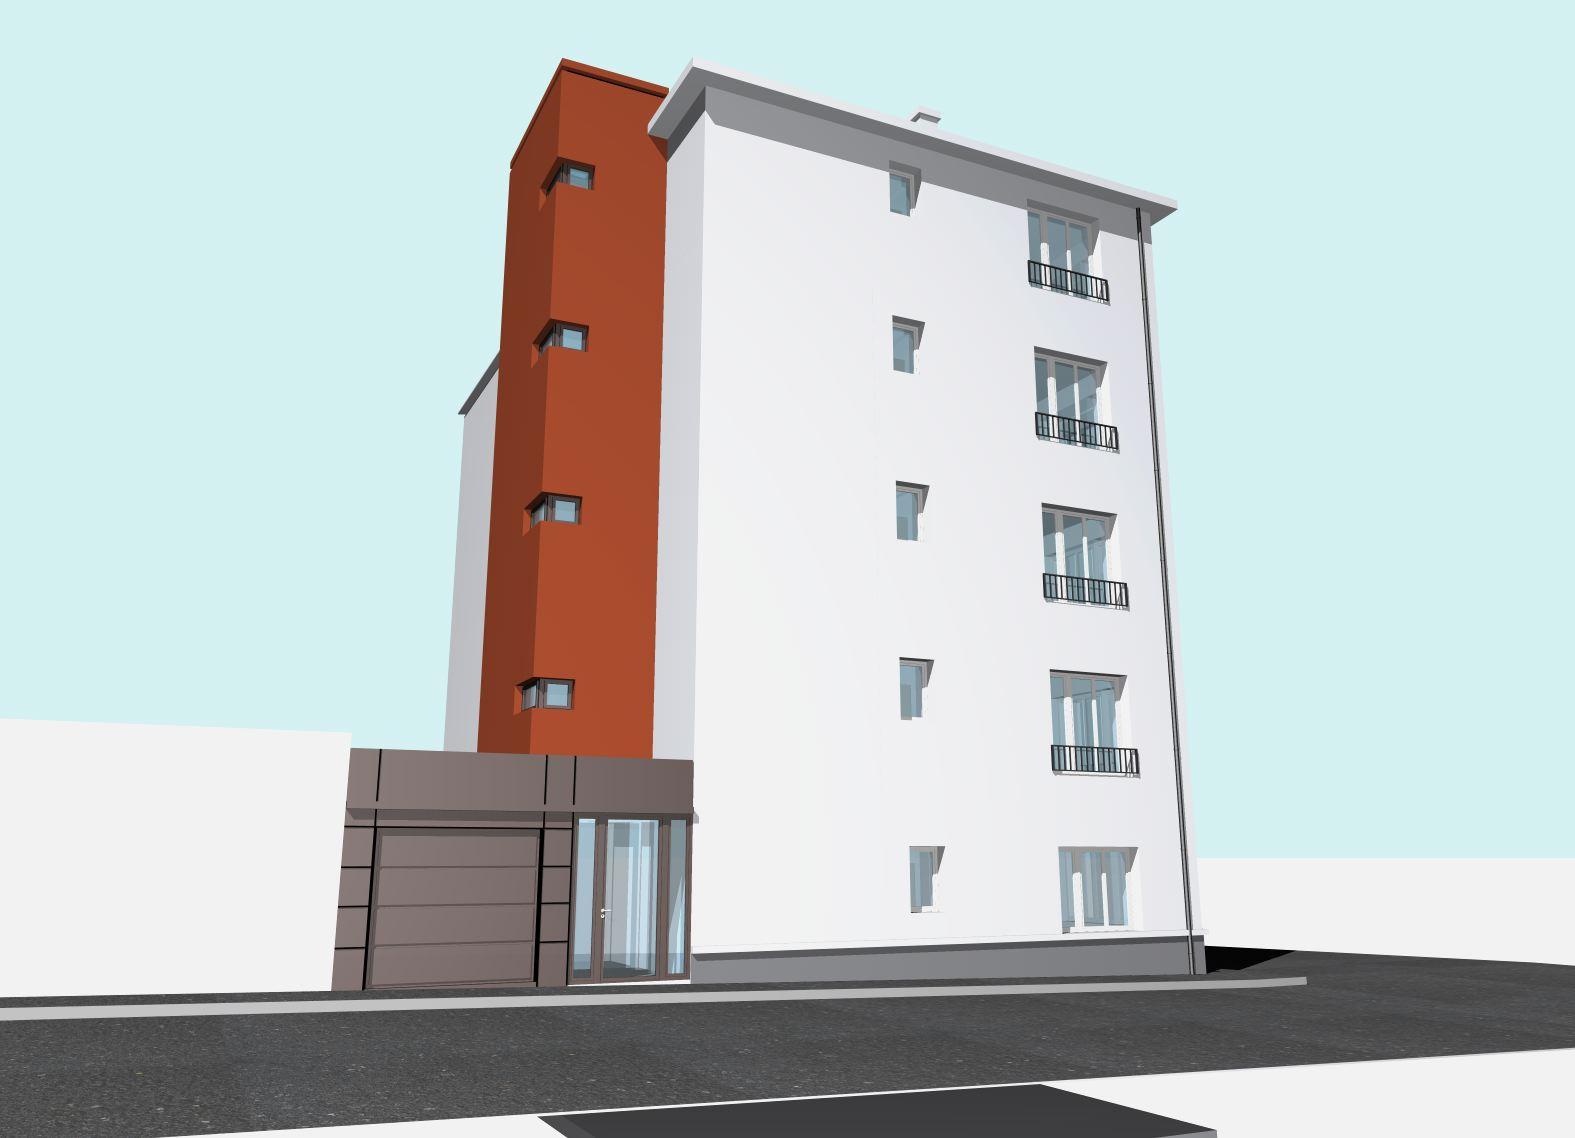 appartement t3 neuf brest centre 188 600 fai 68 m2 brest appartement maison dom immo. Black Bedroom Furniture Sets. Home Design Ideas